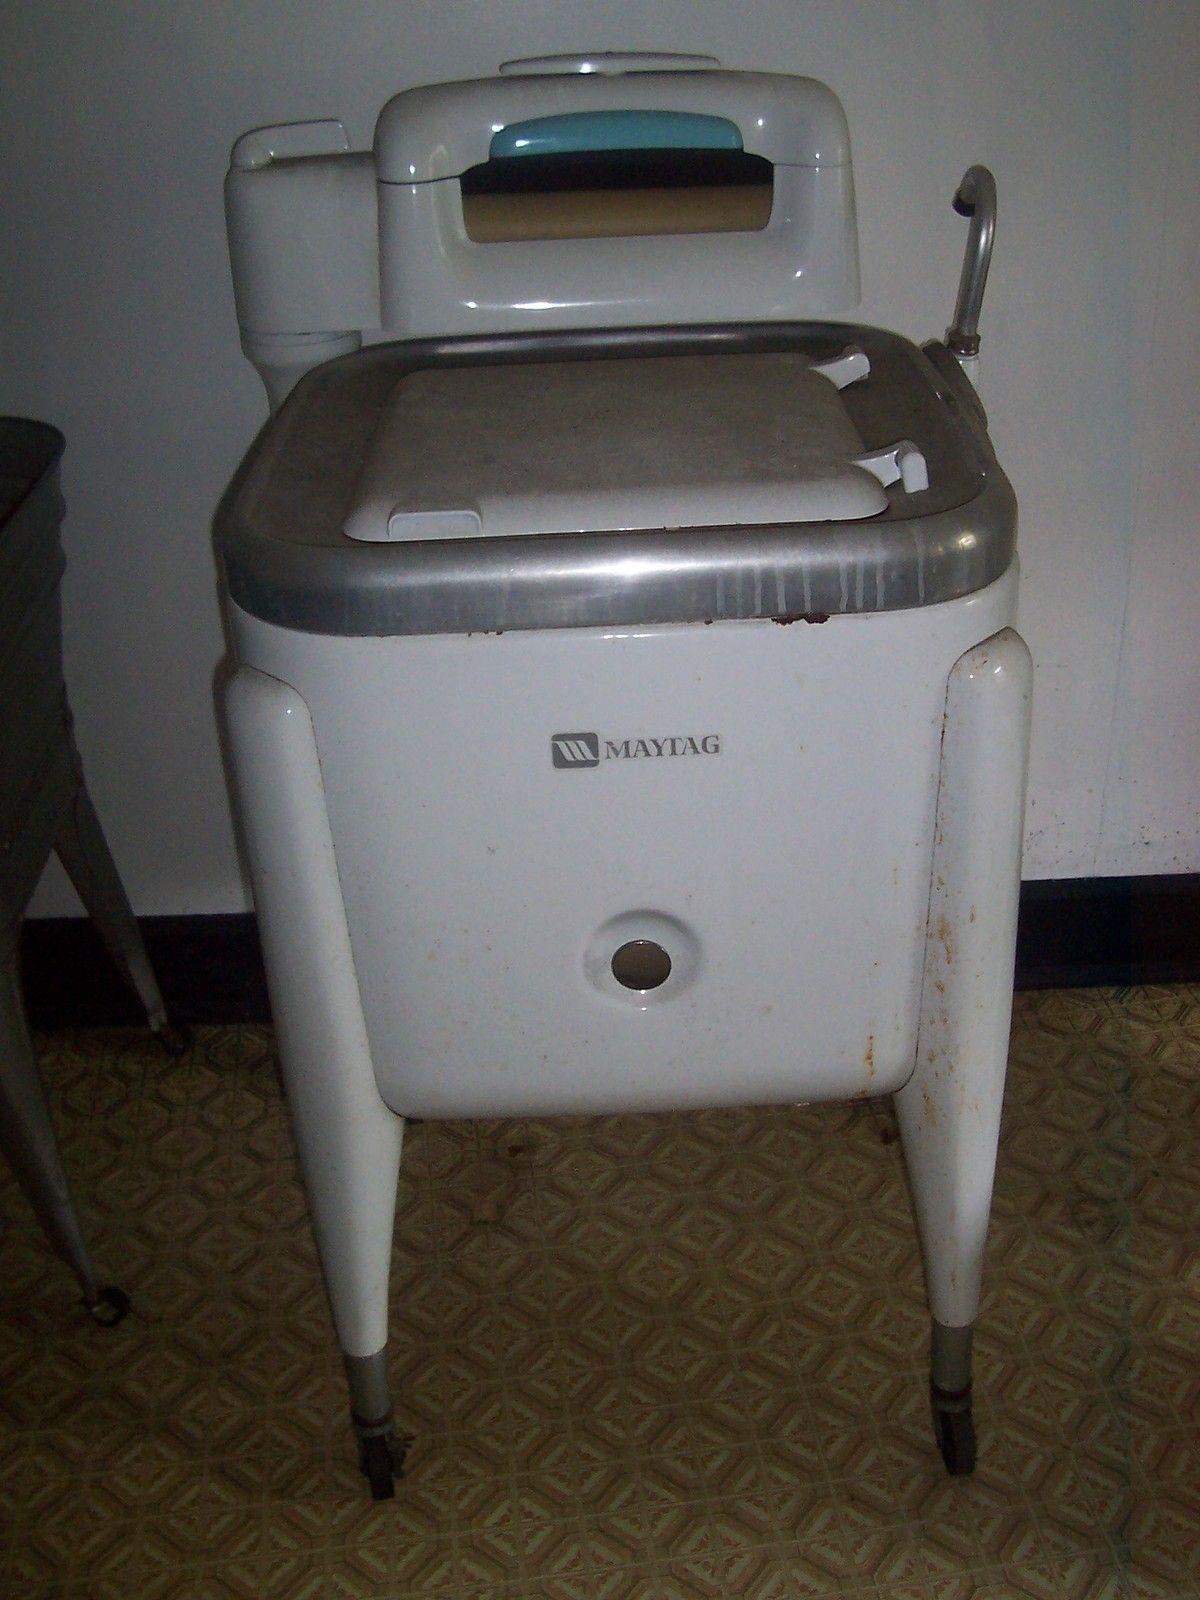 Vintage Maytag Wringer Washing Machine Working Ebay Vintage Washing Machine Washing Machine Vintage Appliances